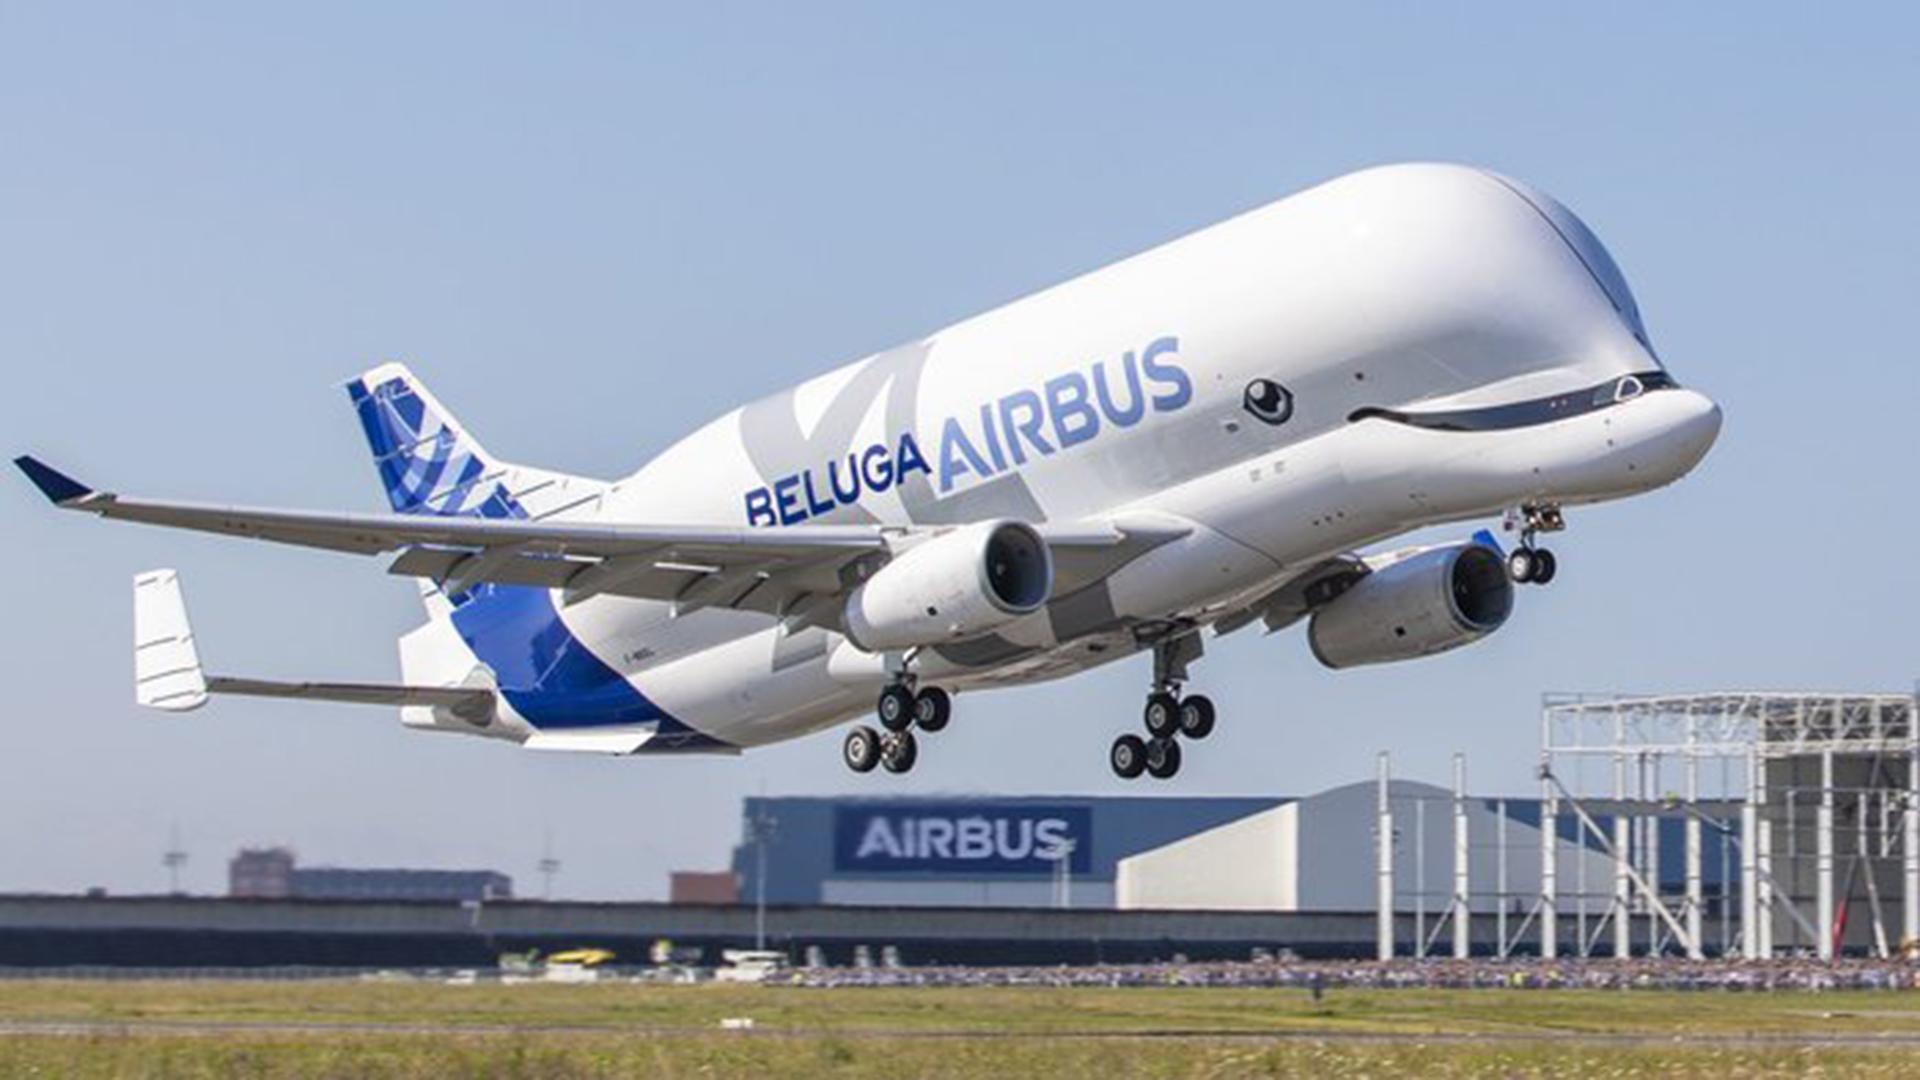 giant airbus plane that